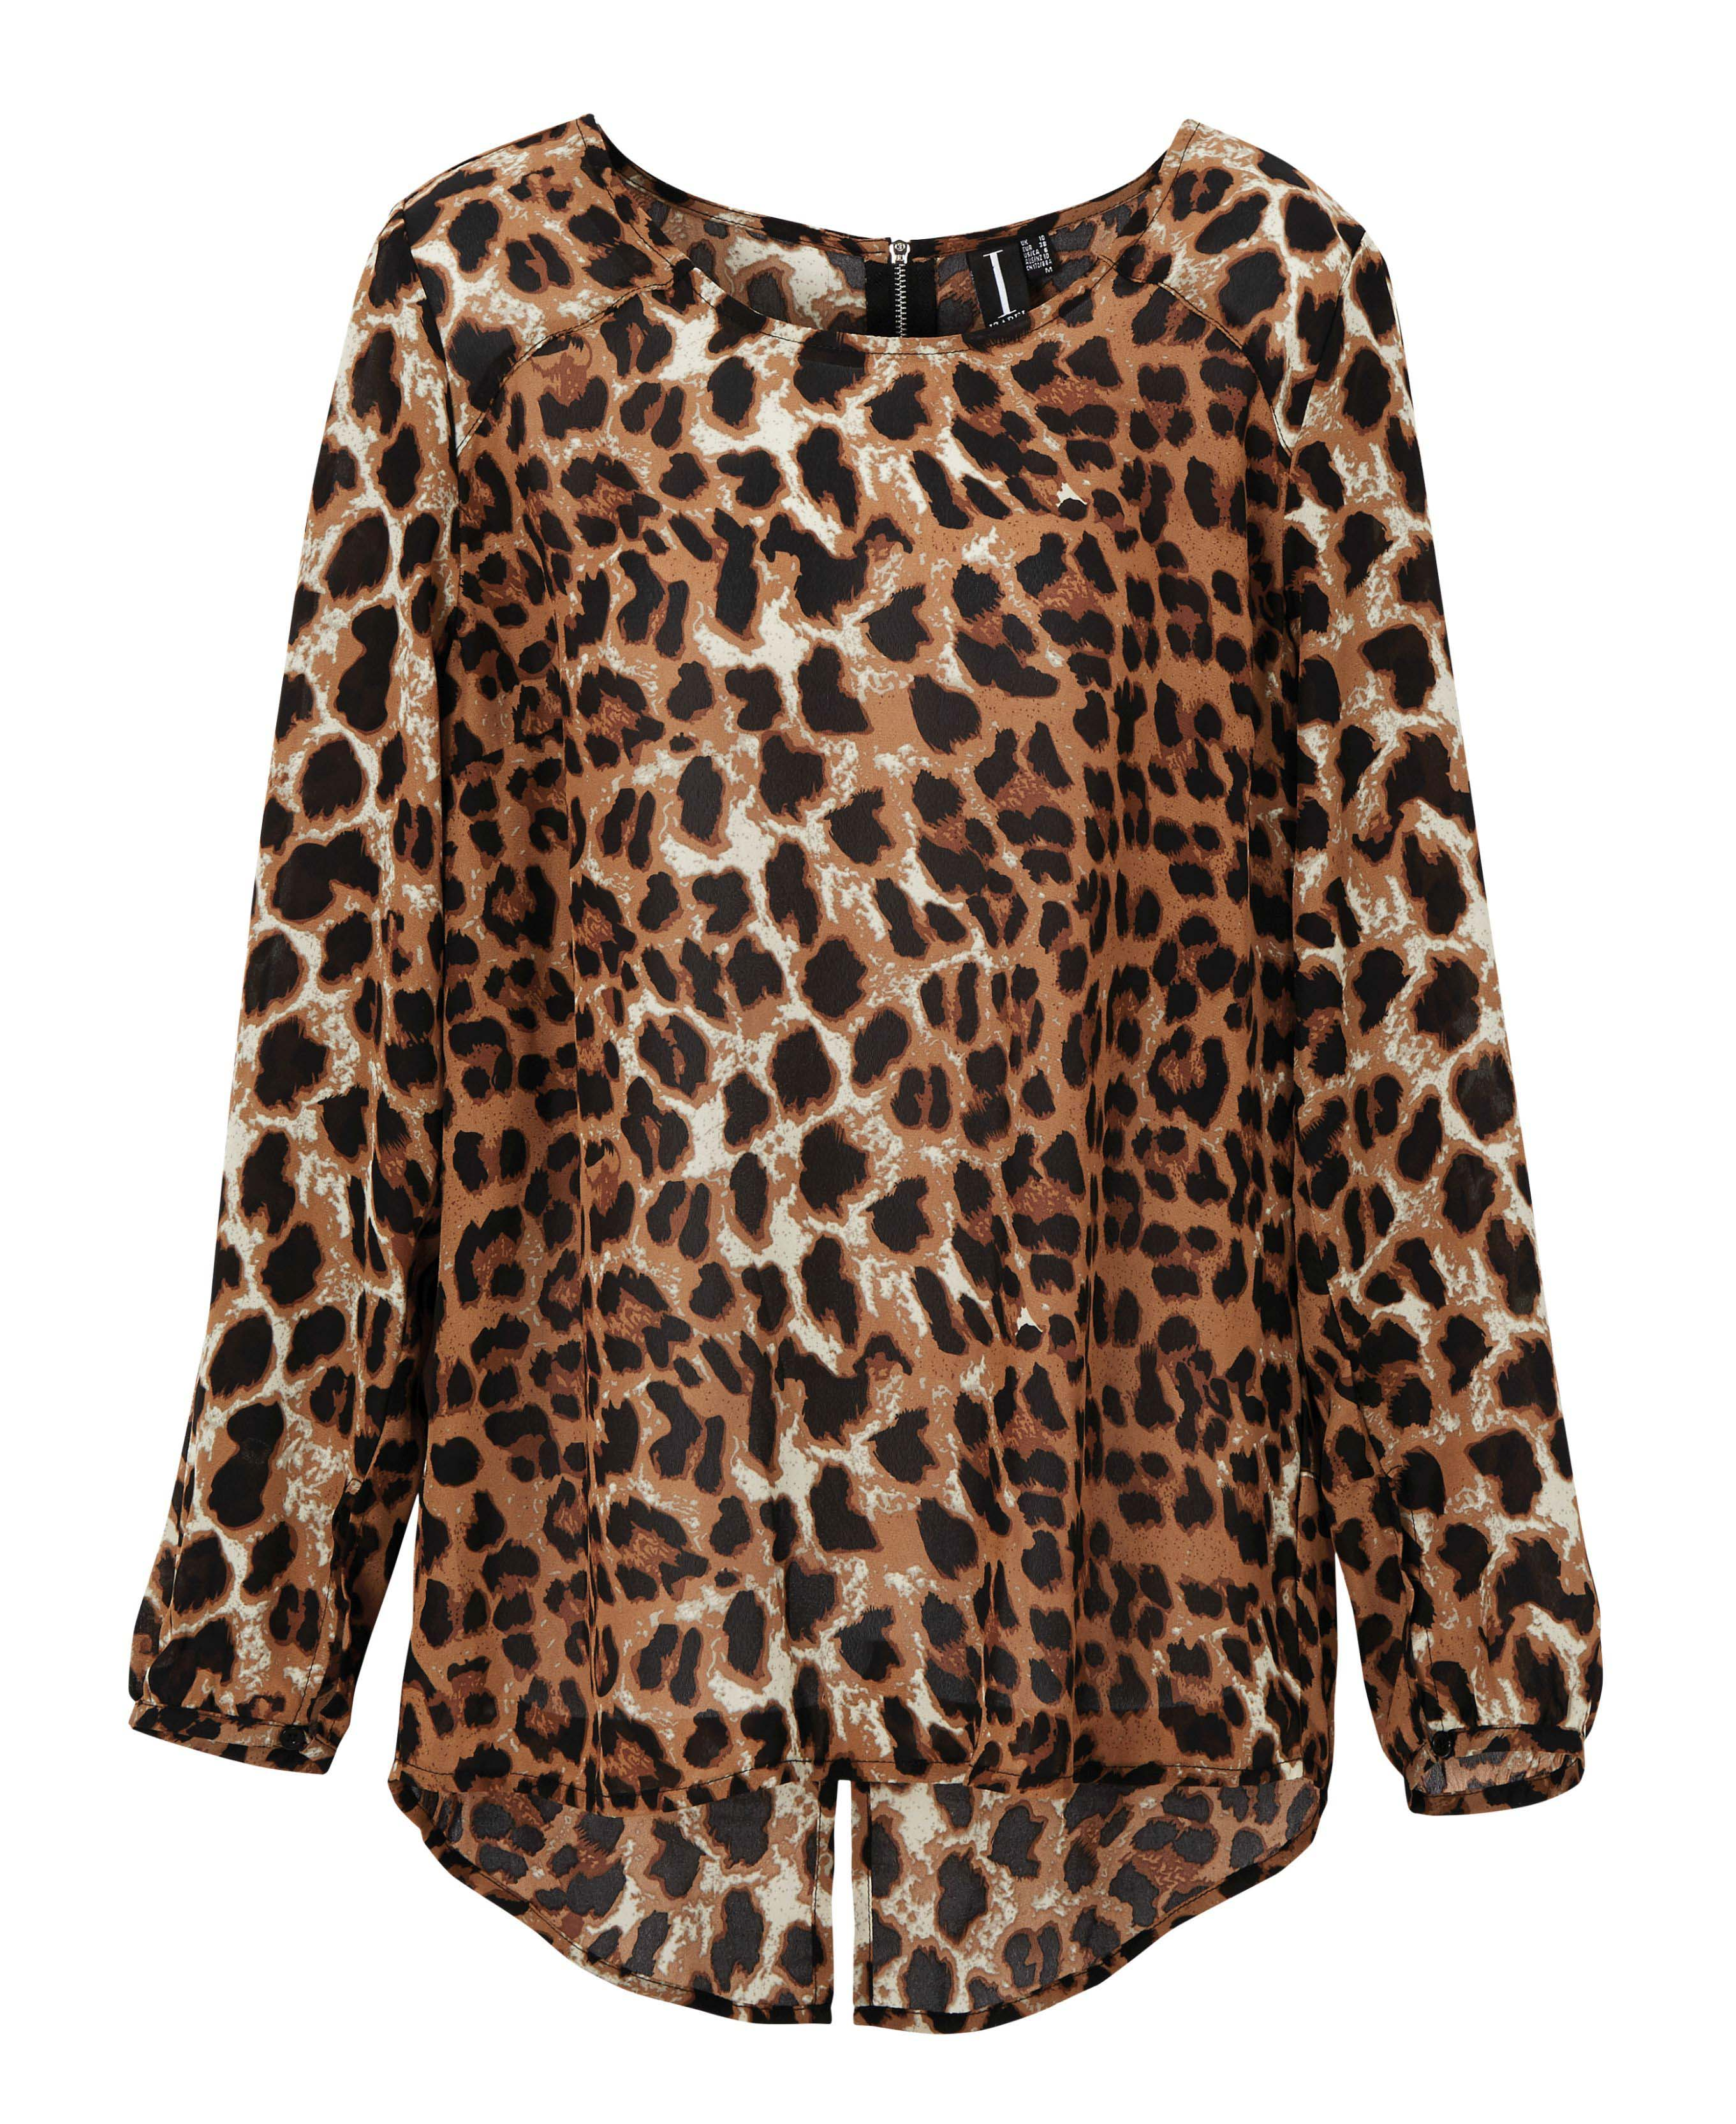 6090701 Izabel London LS Leopard Print Top $109.99 Instore March 02 2016